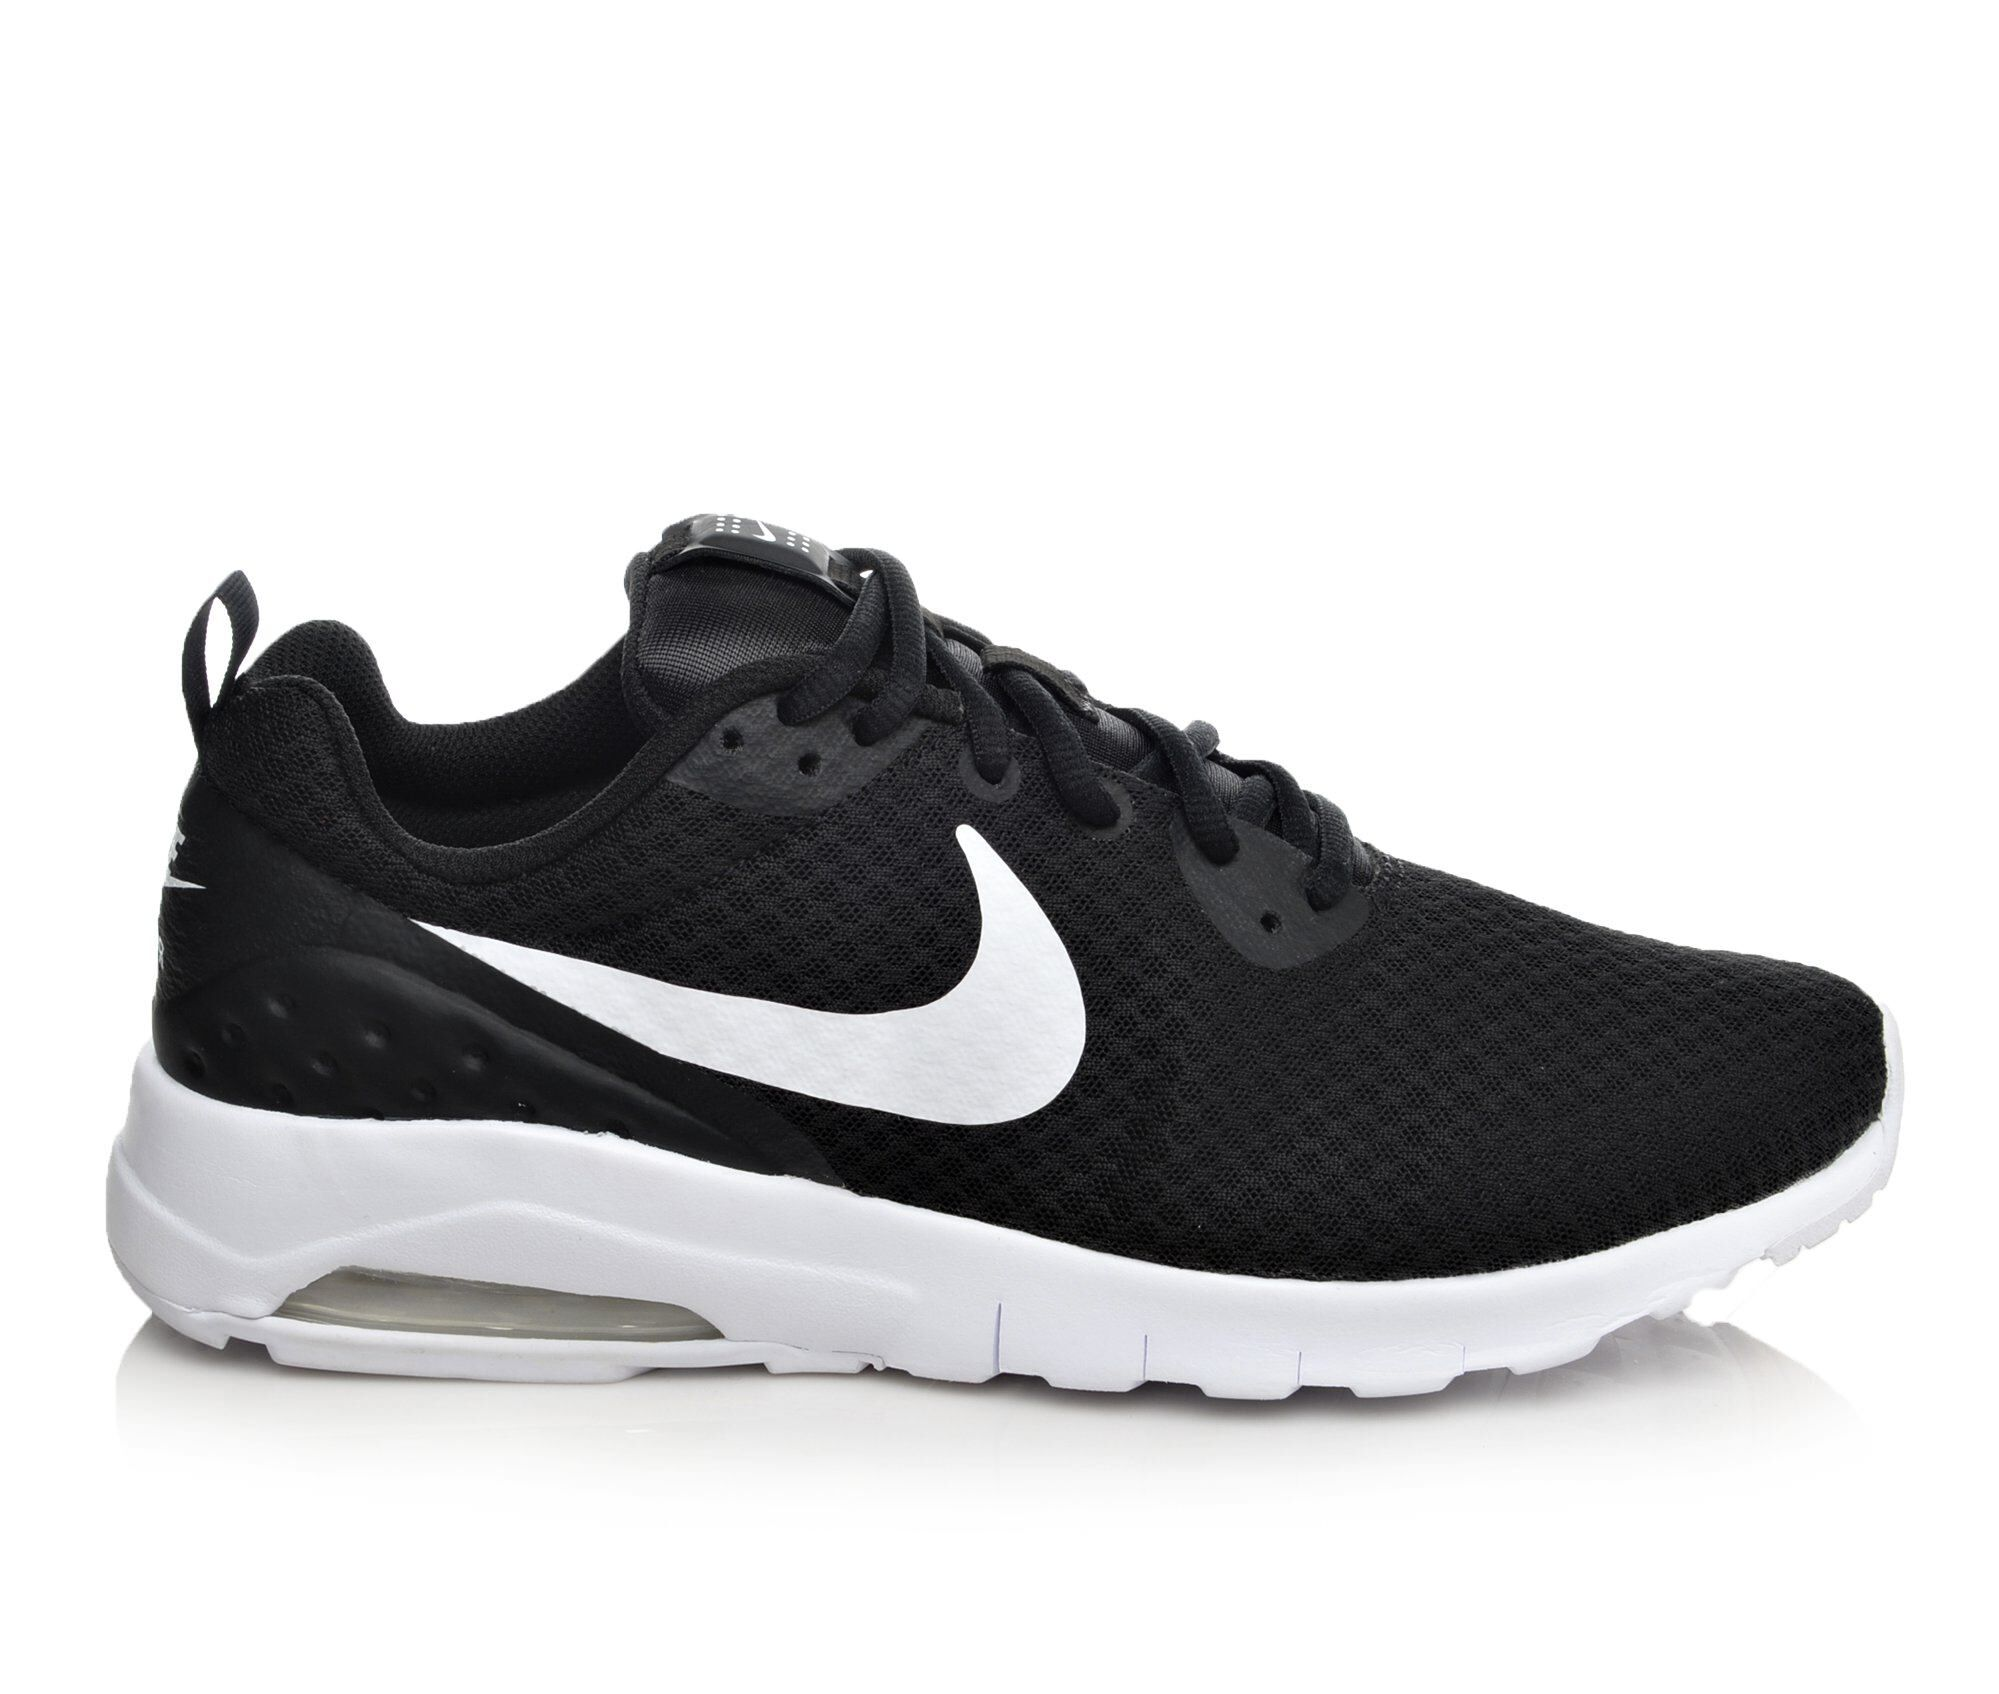 Images. Men's Nike Air Max Motion LW Sneakers